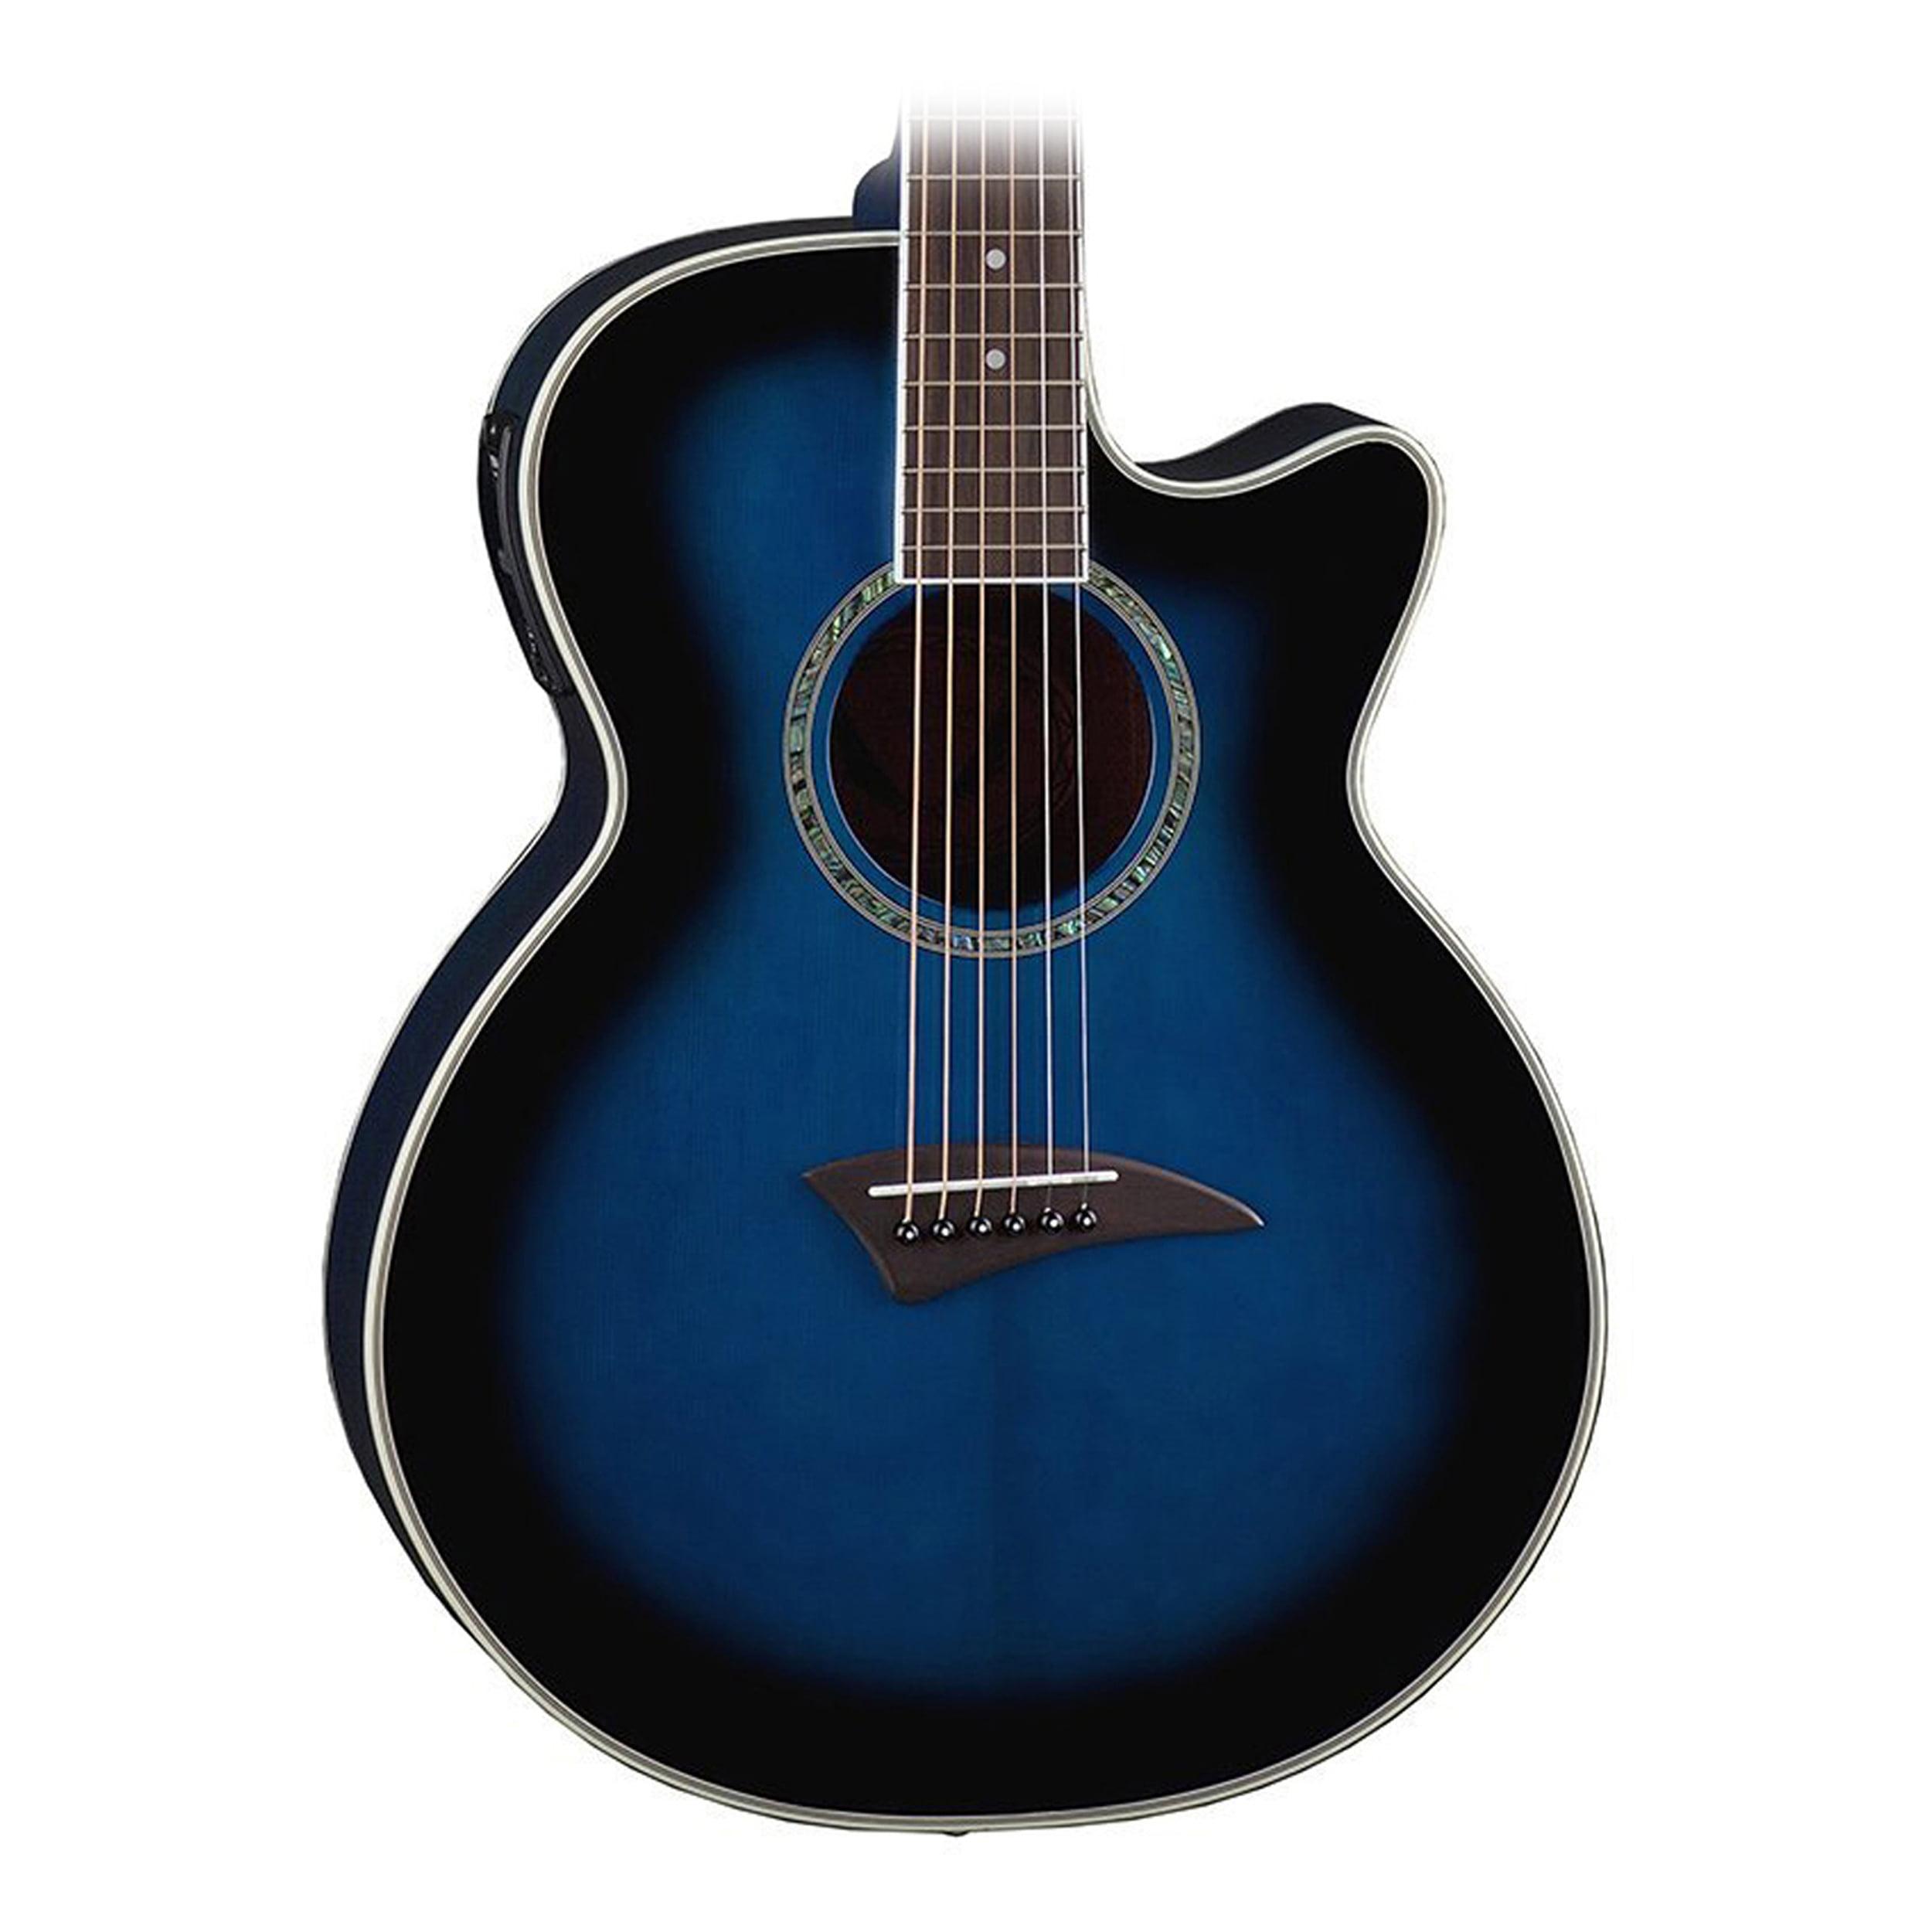 Dean AXS Performer Acoustic Electric Guitar Blue Burst by Dean